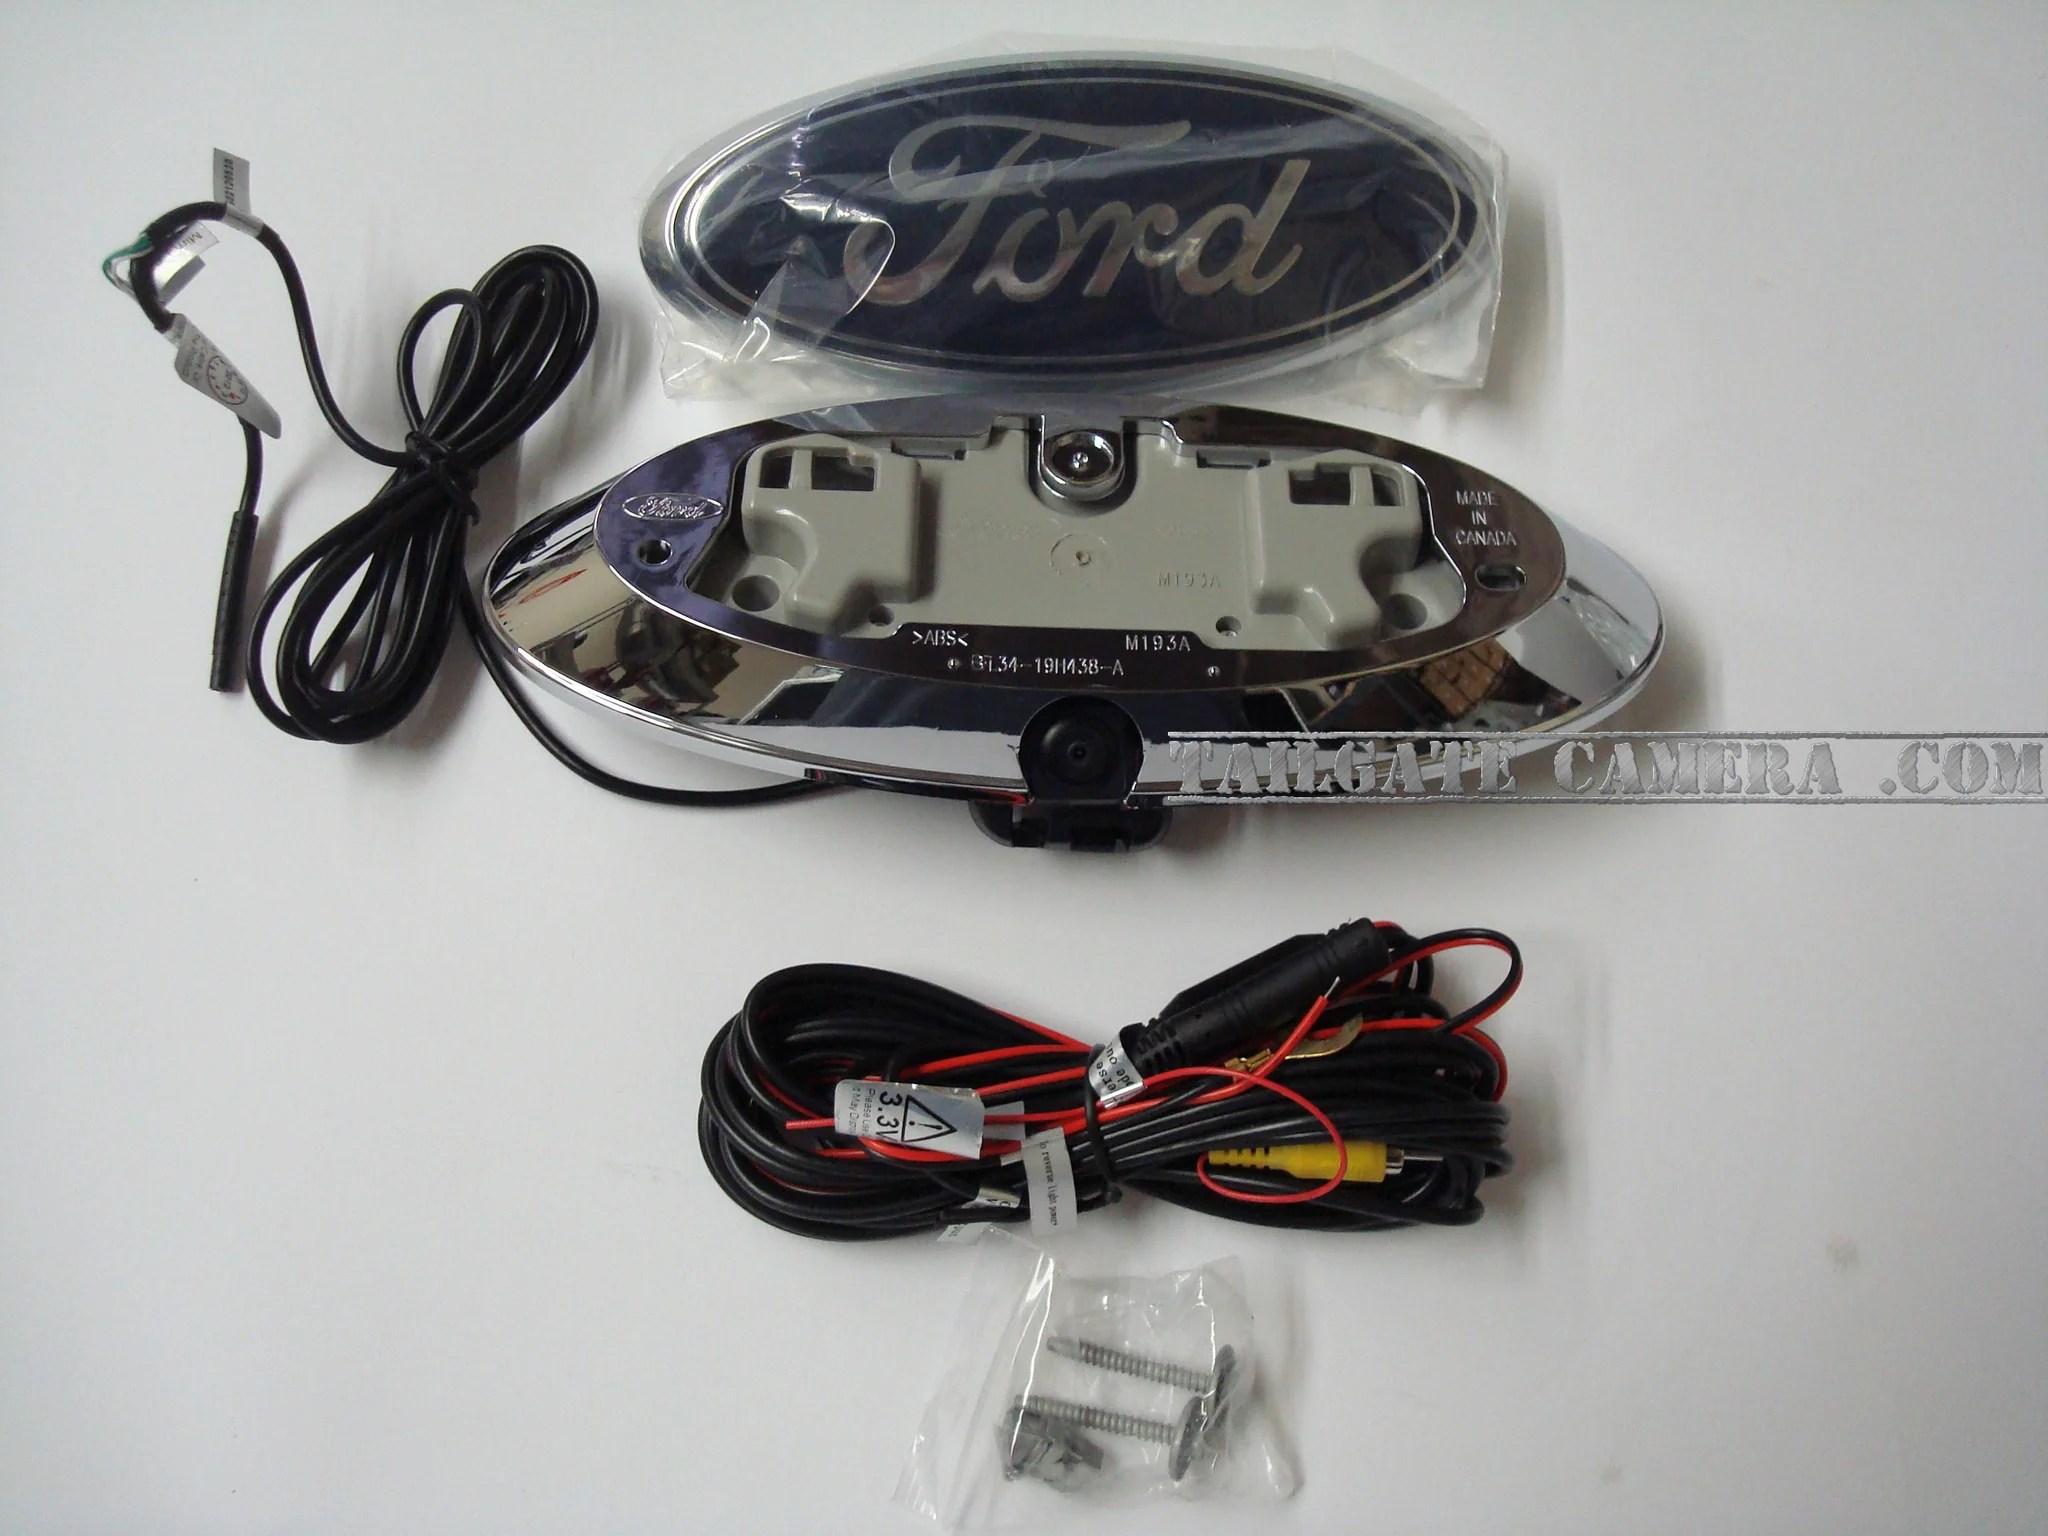 hight resolution of ford f series truck emblem camera